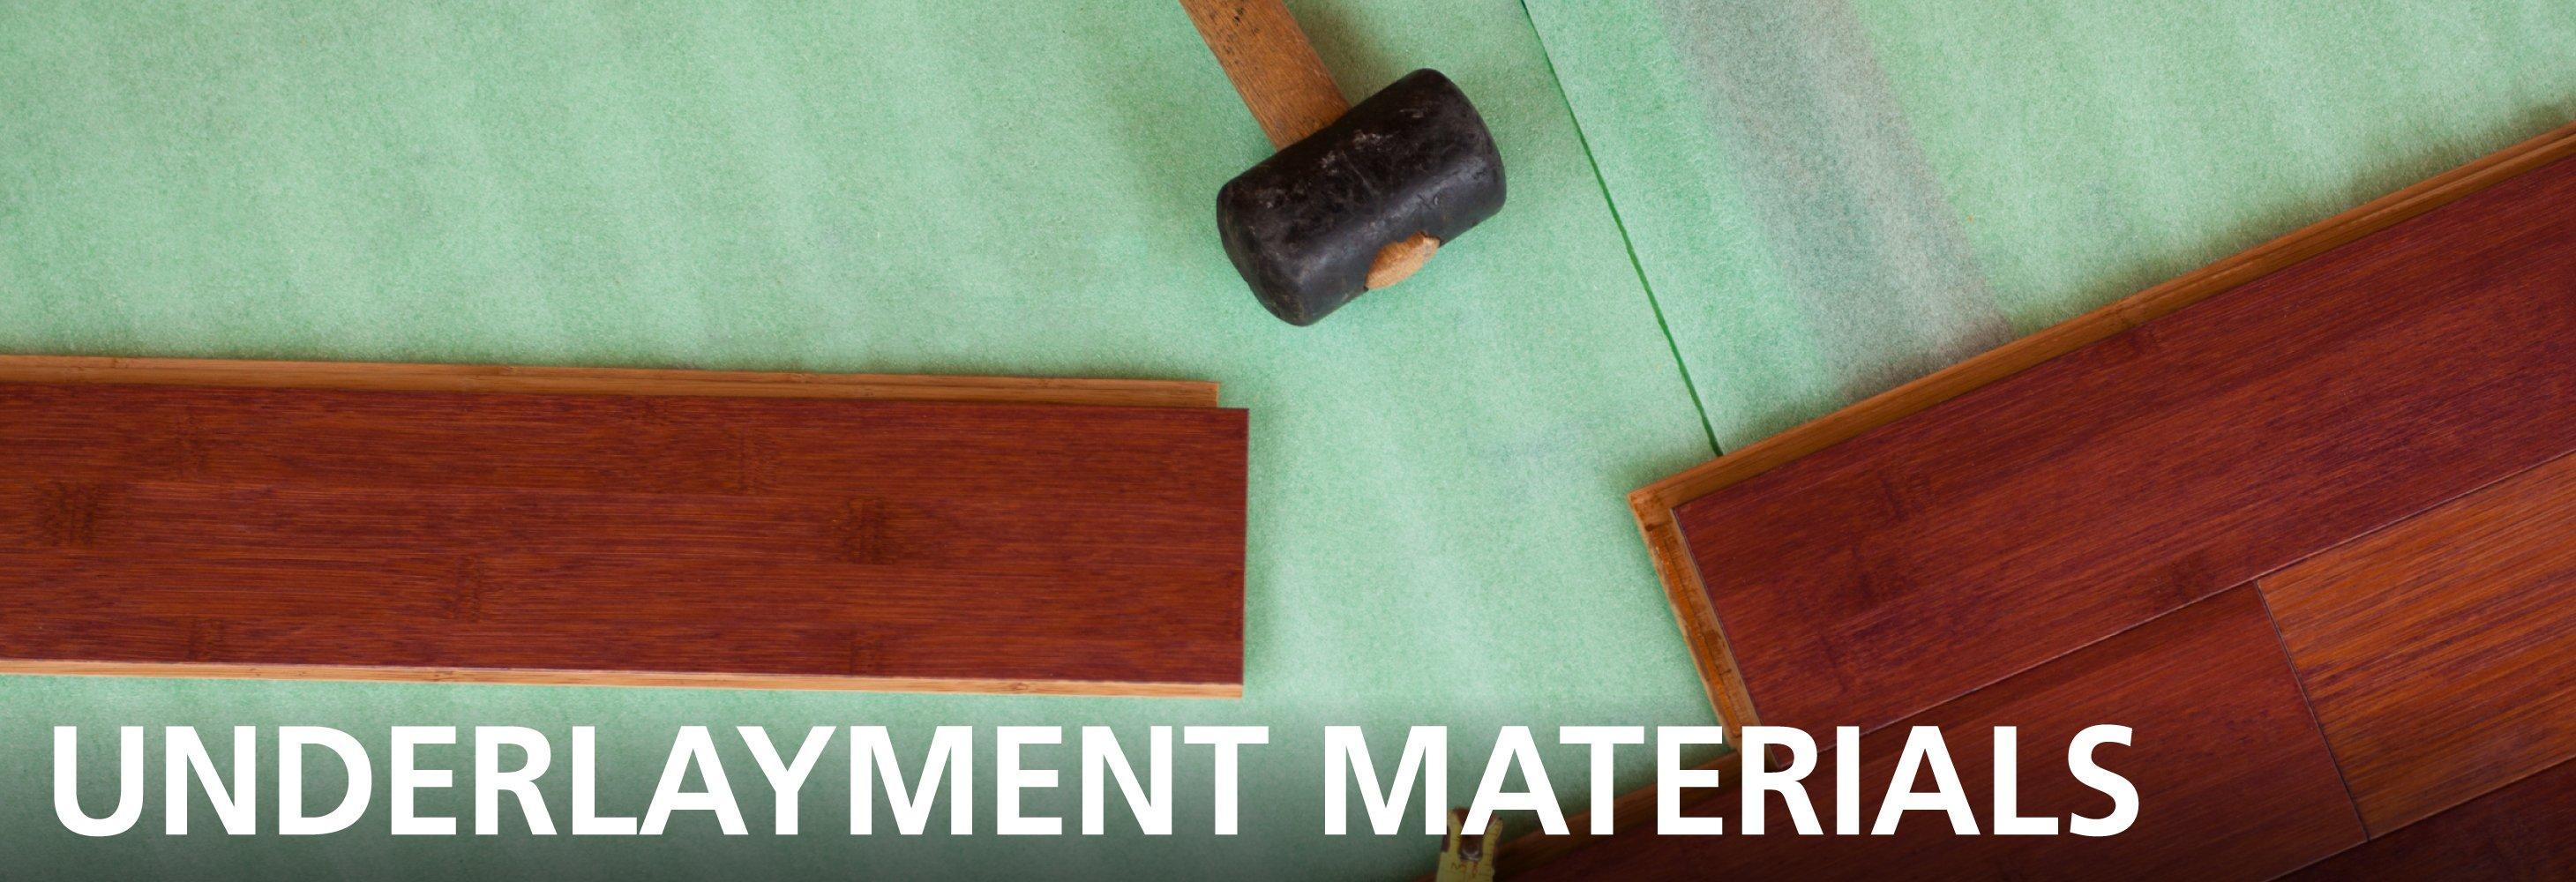 Wood U0026 Laminate Floor Underlayment. Underlayment